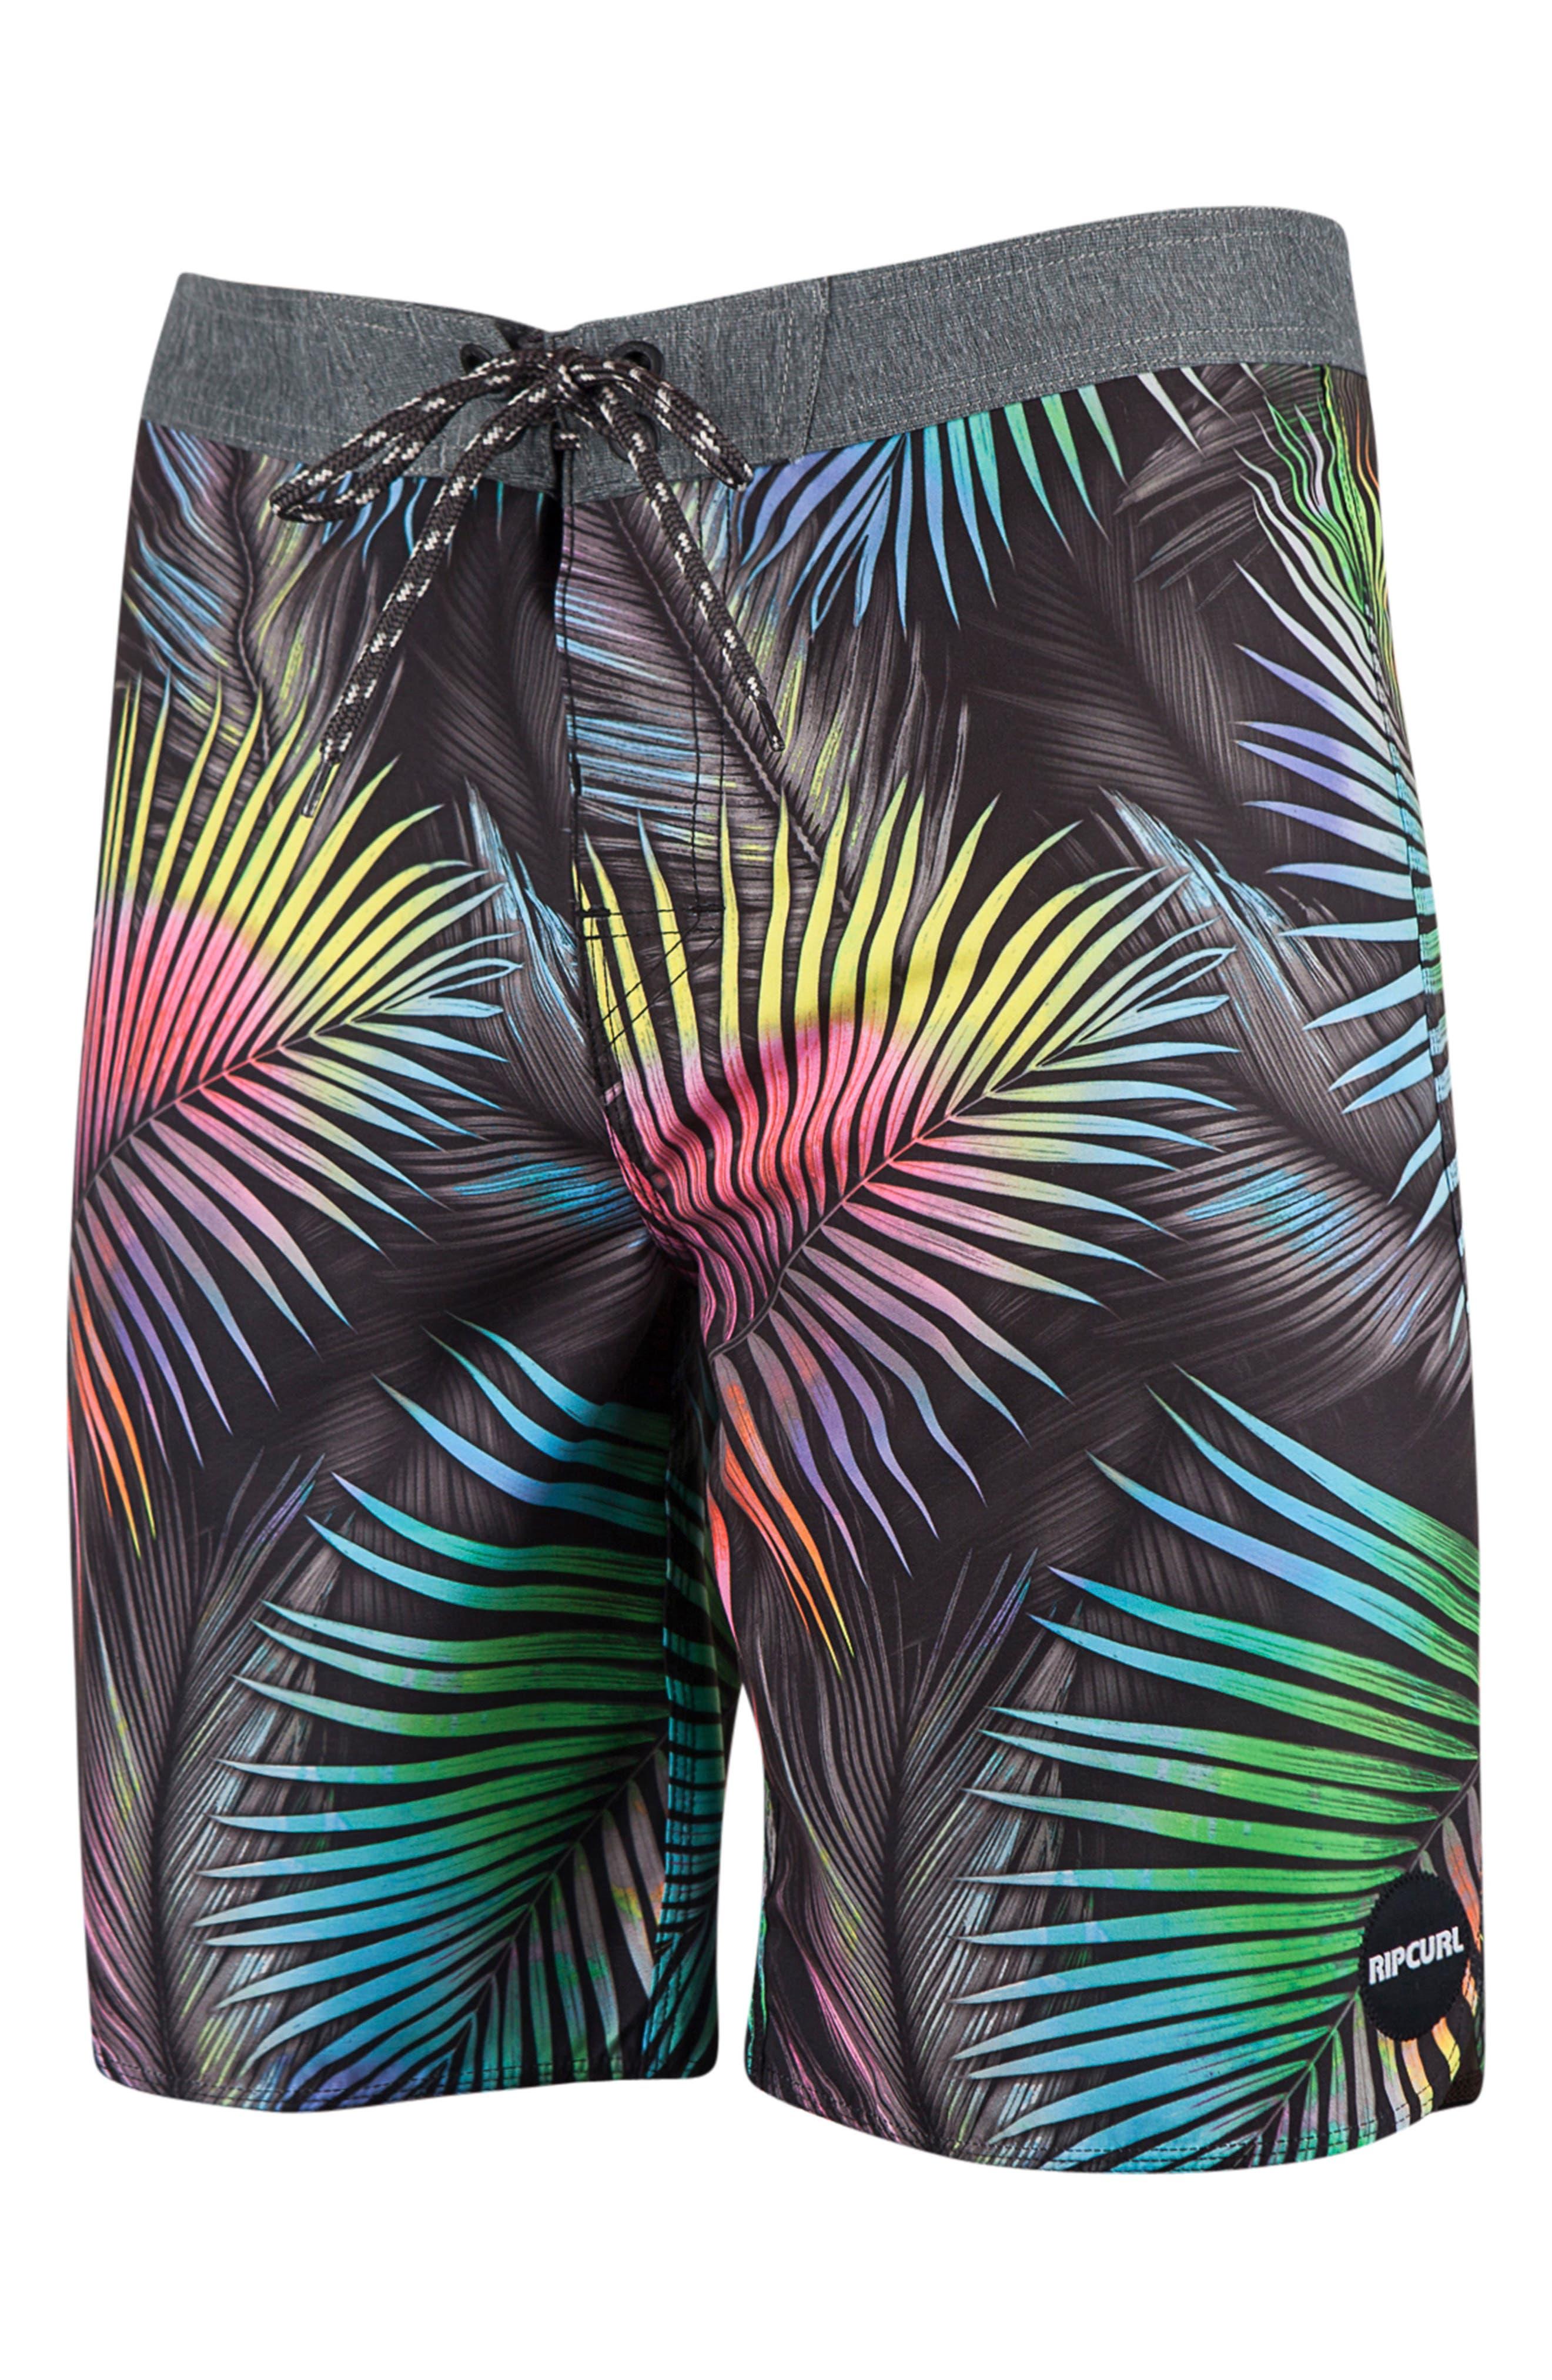 Finley Board Shorts,                         Main,                         color, Charcoal Grey